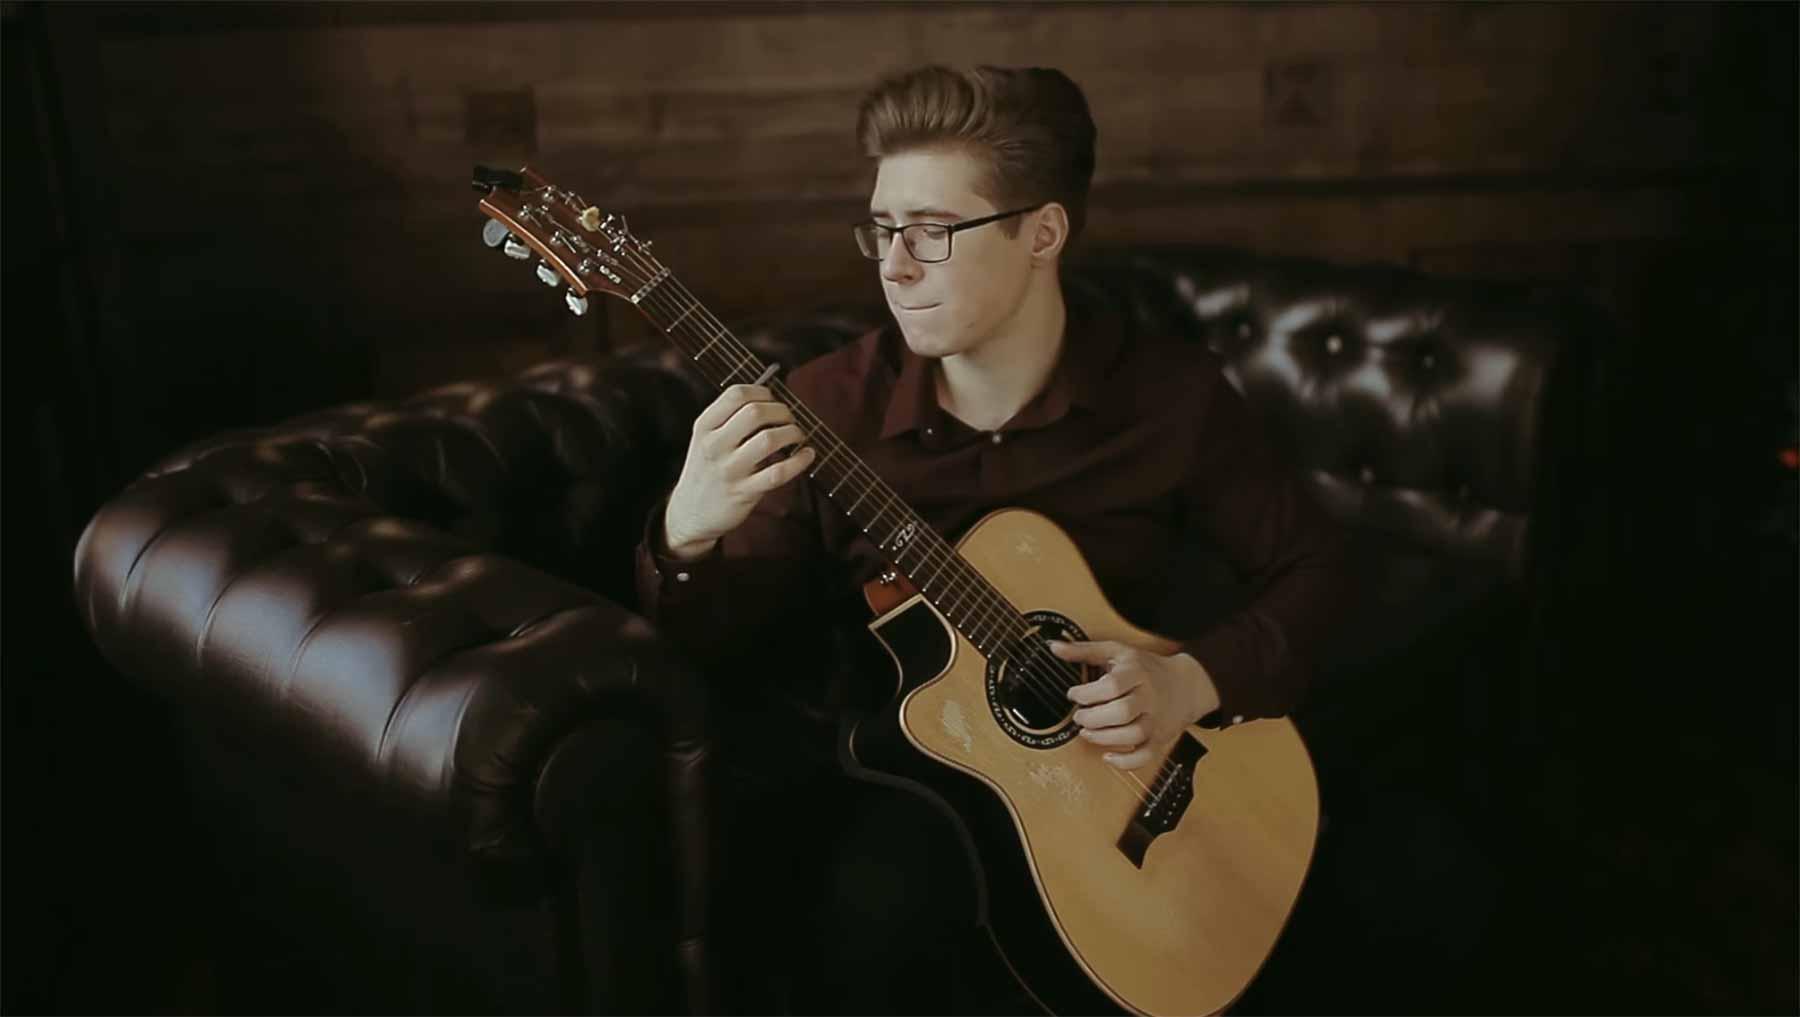 Wundervoll entspannende Gitarrencover von Alexandr Misko